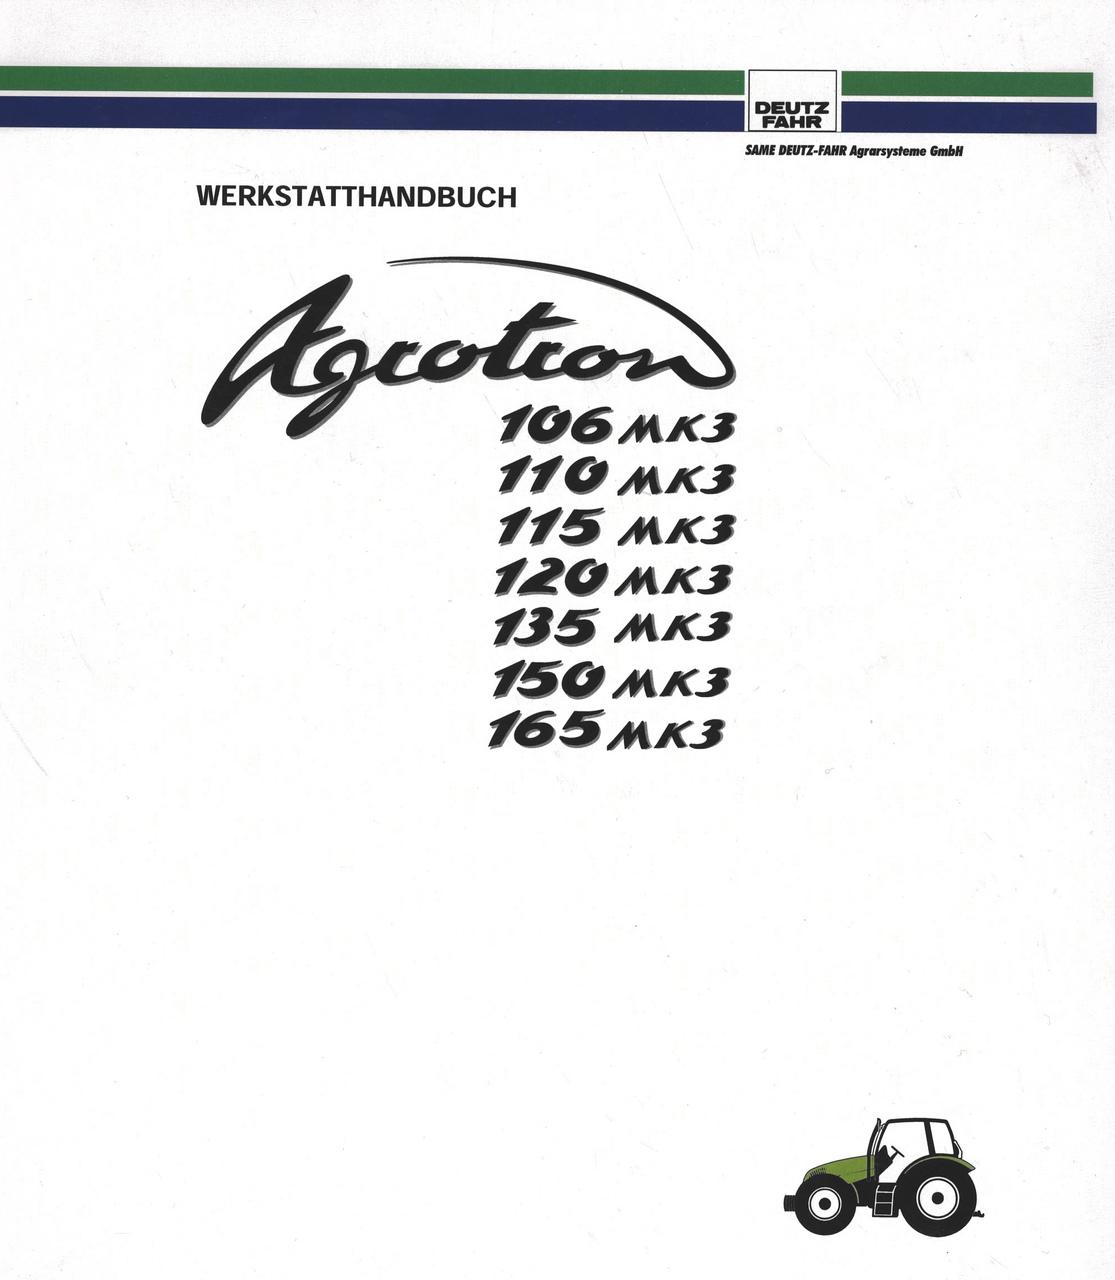 AGROTRON 106 MK3 - AGROTRON 110 MK3 - AGROTRON 115 MK3 - AGROTRON 120 MK3 - AGROTRON 135 MK3 - AGROTRON 150 MK3 - AGROTRON 165 MK3 - Werkstatthandbuch